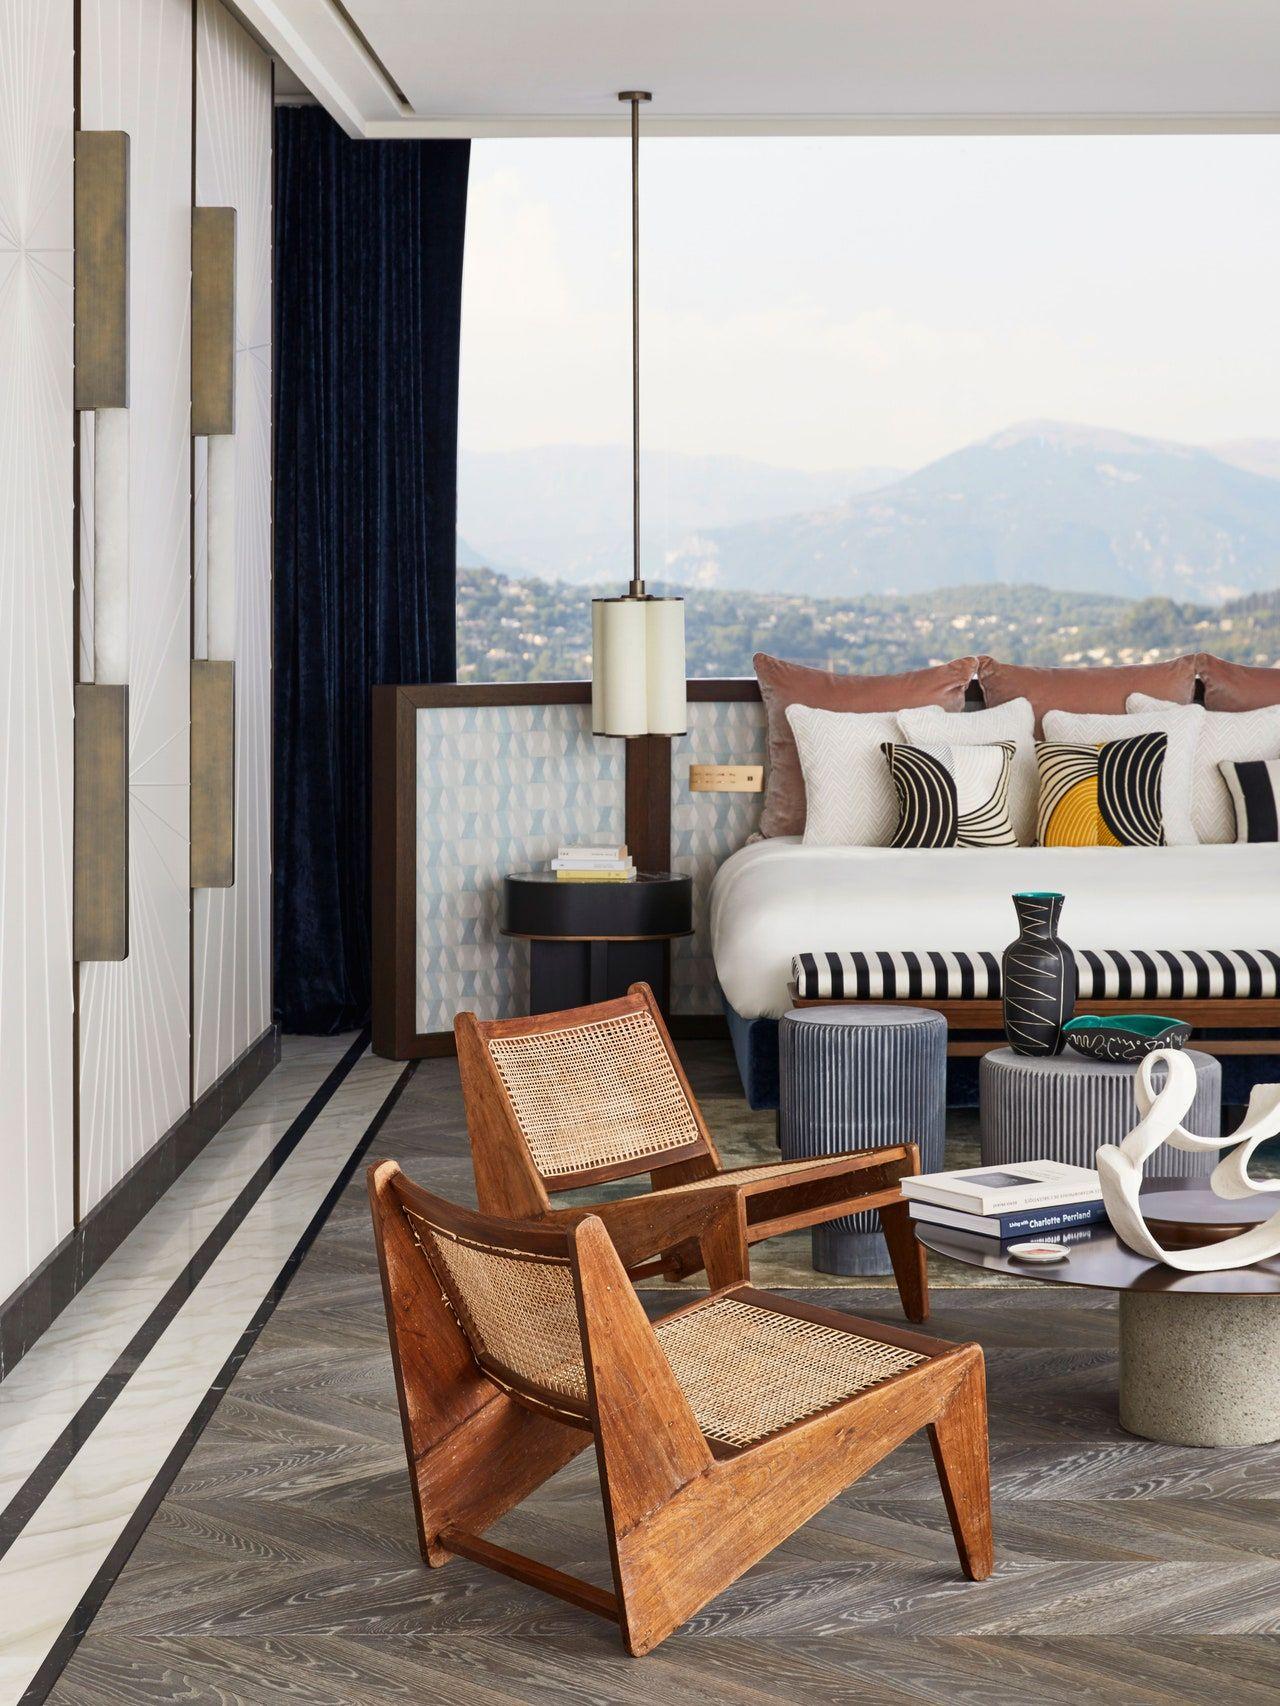 Tour a Dreamy Family Escape High Above Cannes